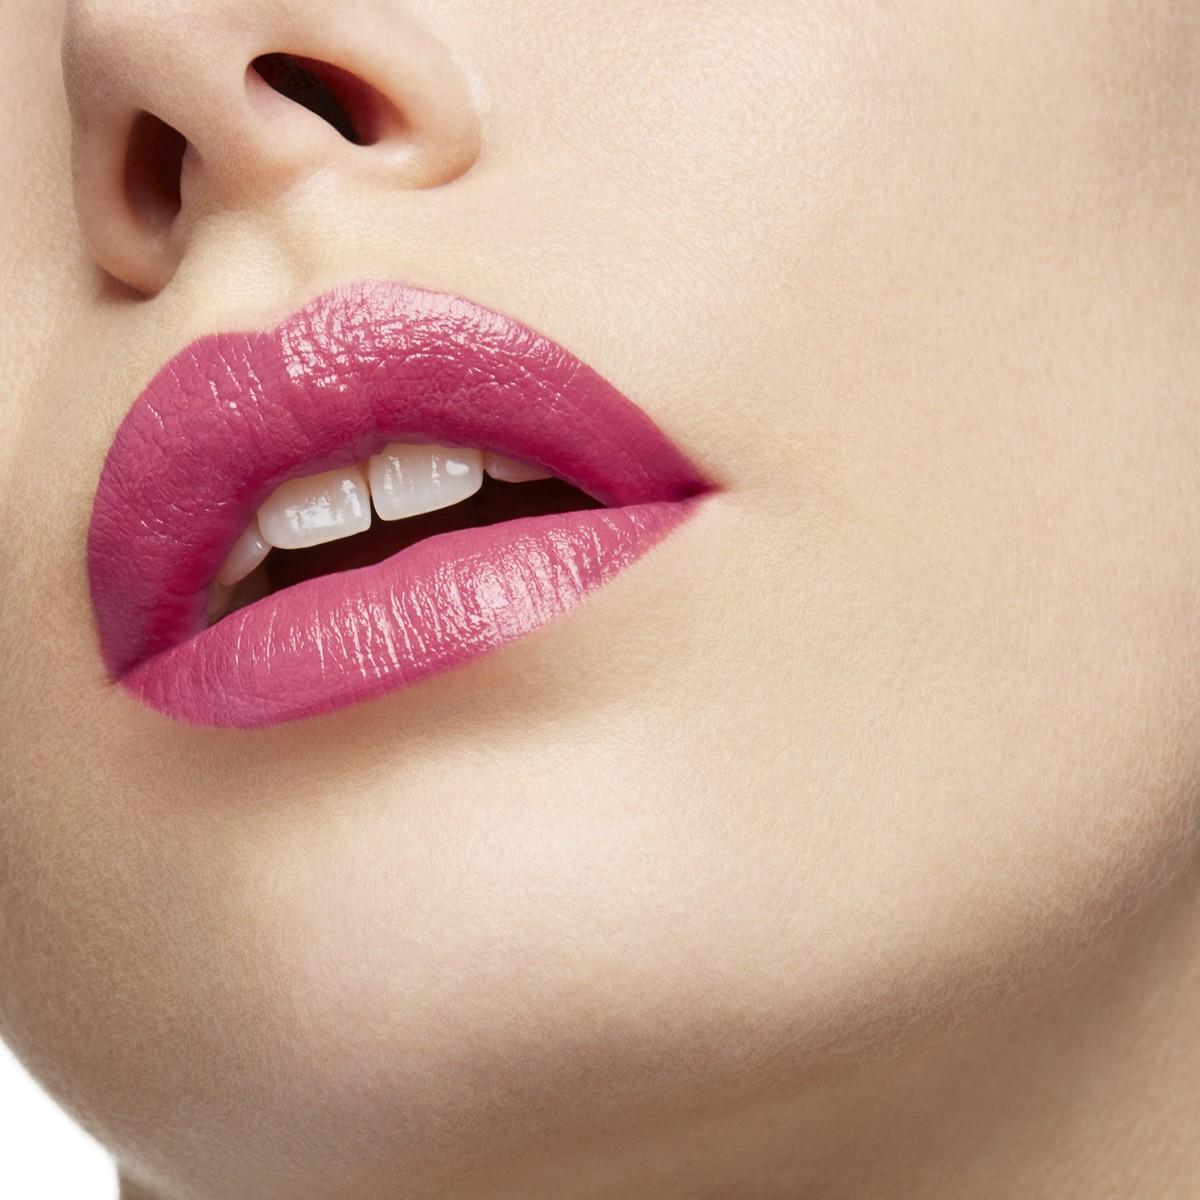 Woman Beauty - リップカラー バンガリ 100 - Christian Louboutin